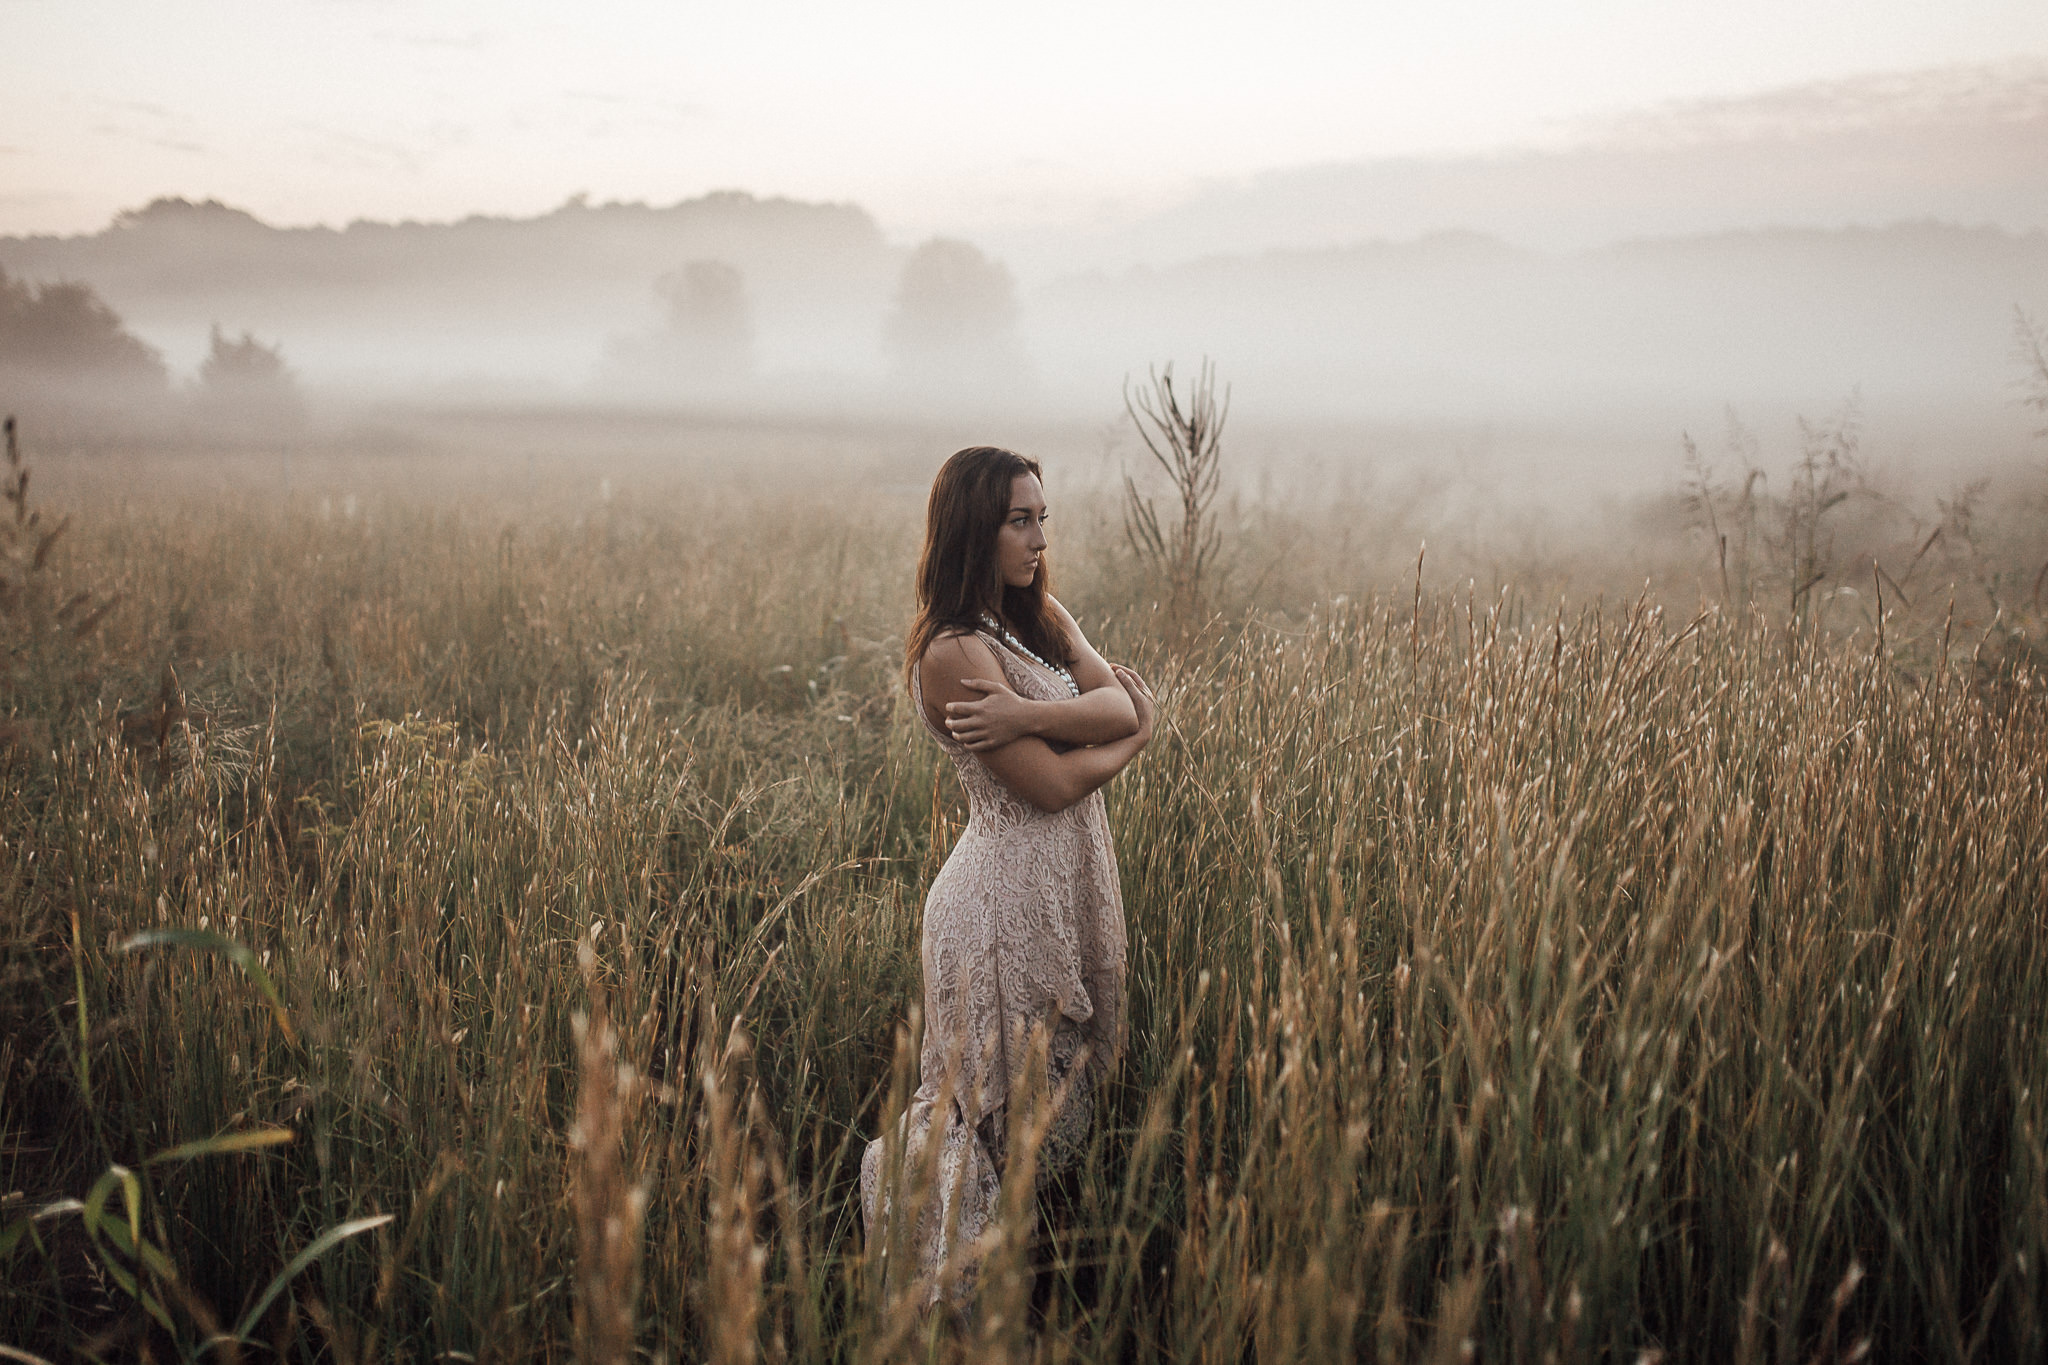 memphis-senior-portrait-photographer-bohemian-sunrise-photoss-7.jpg